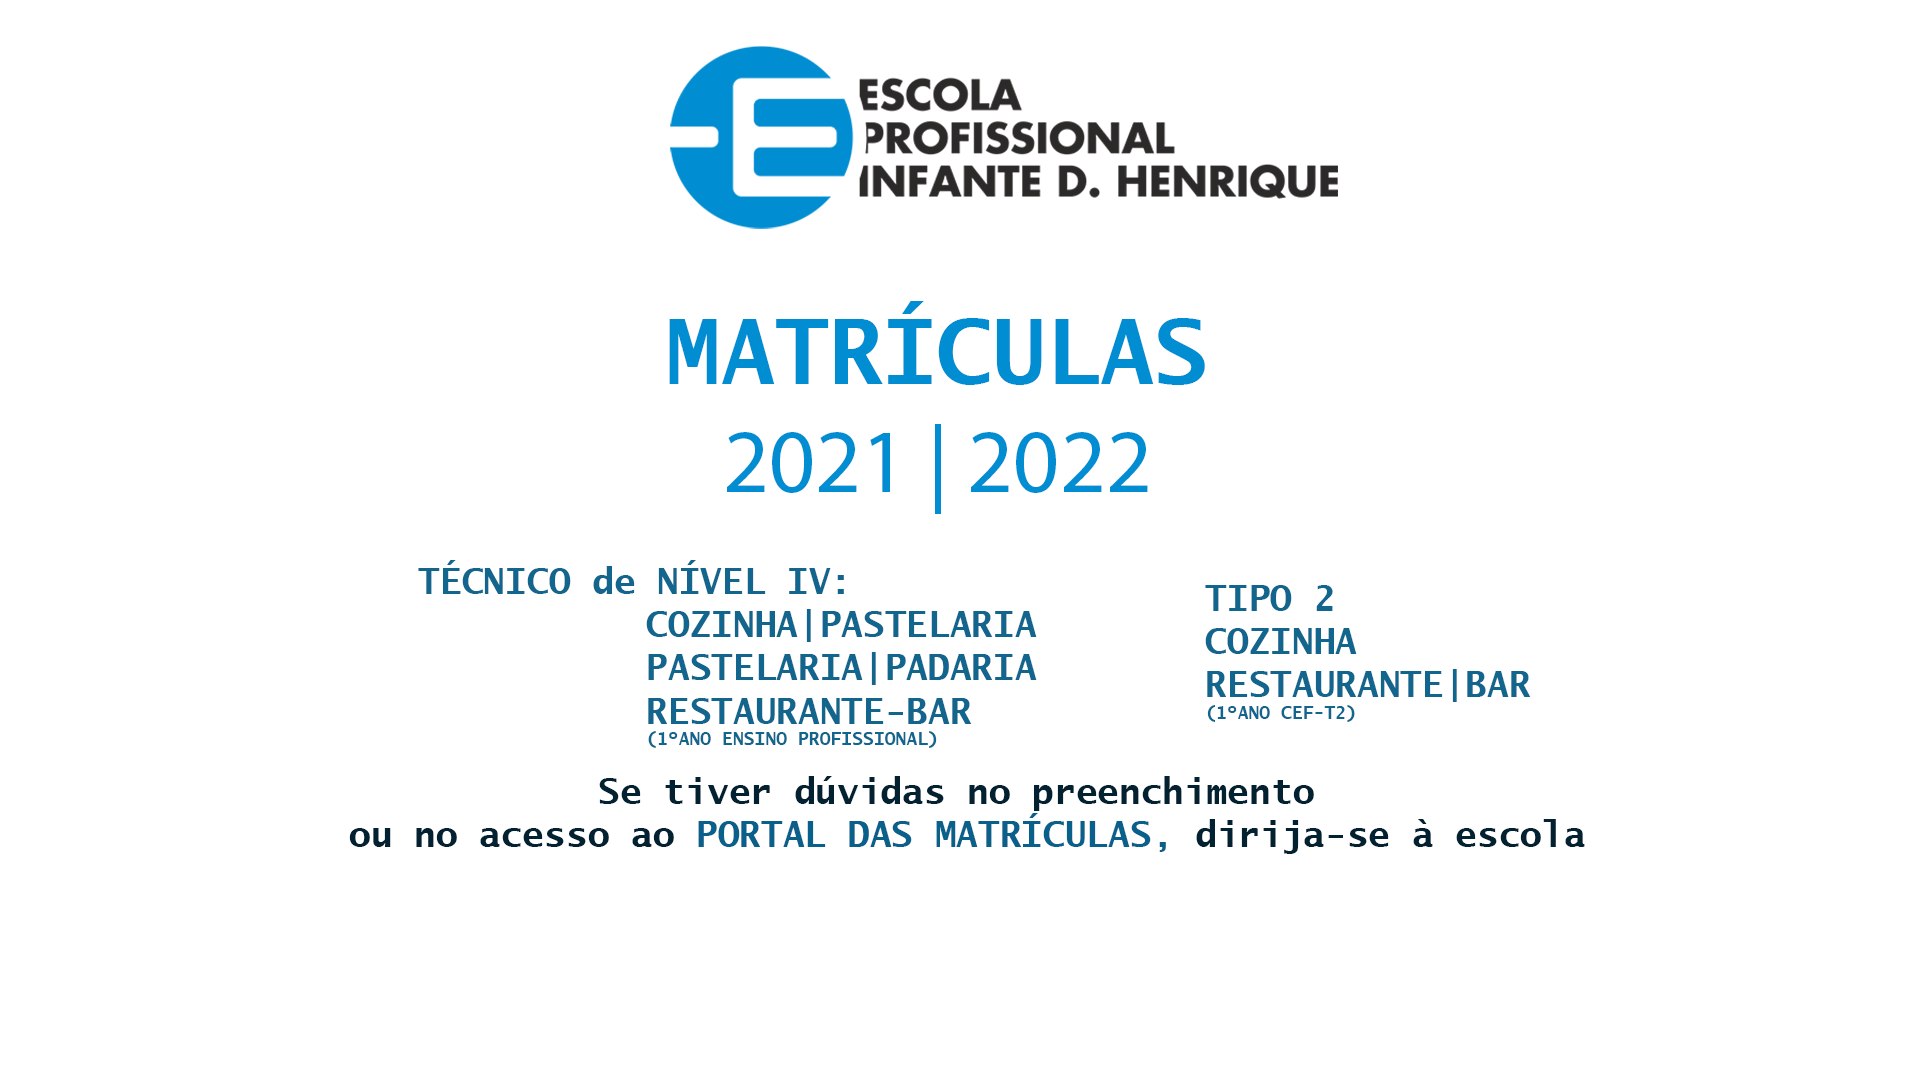 matrculas_2021-2022_VALIDO